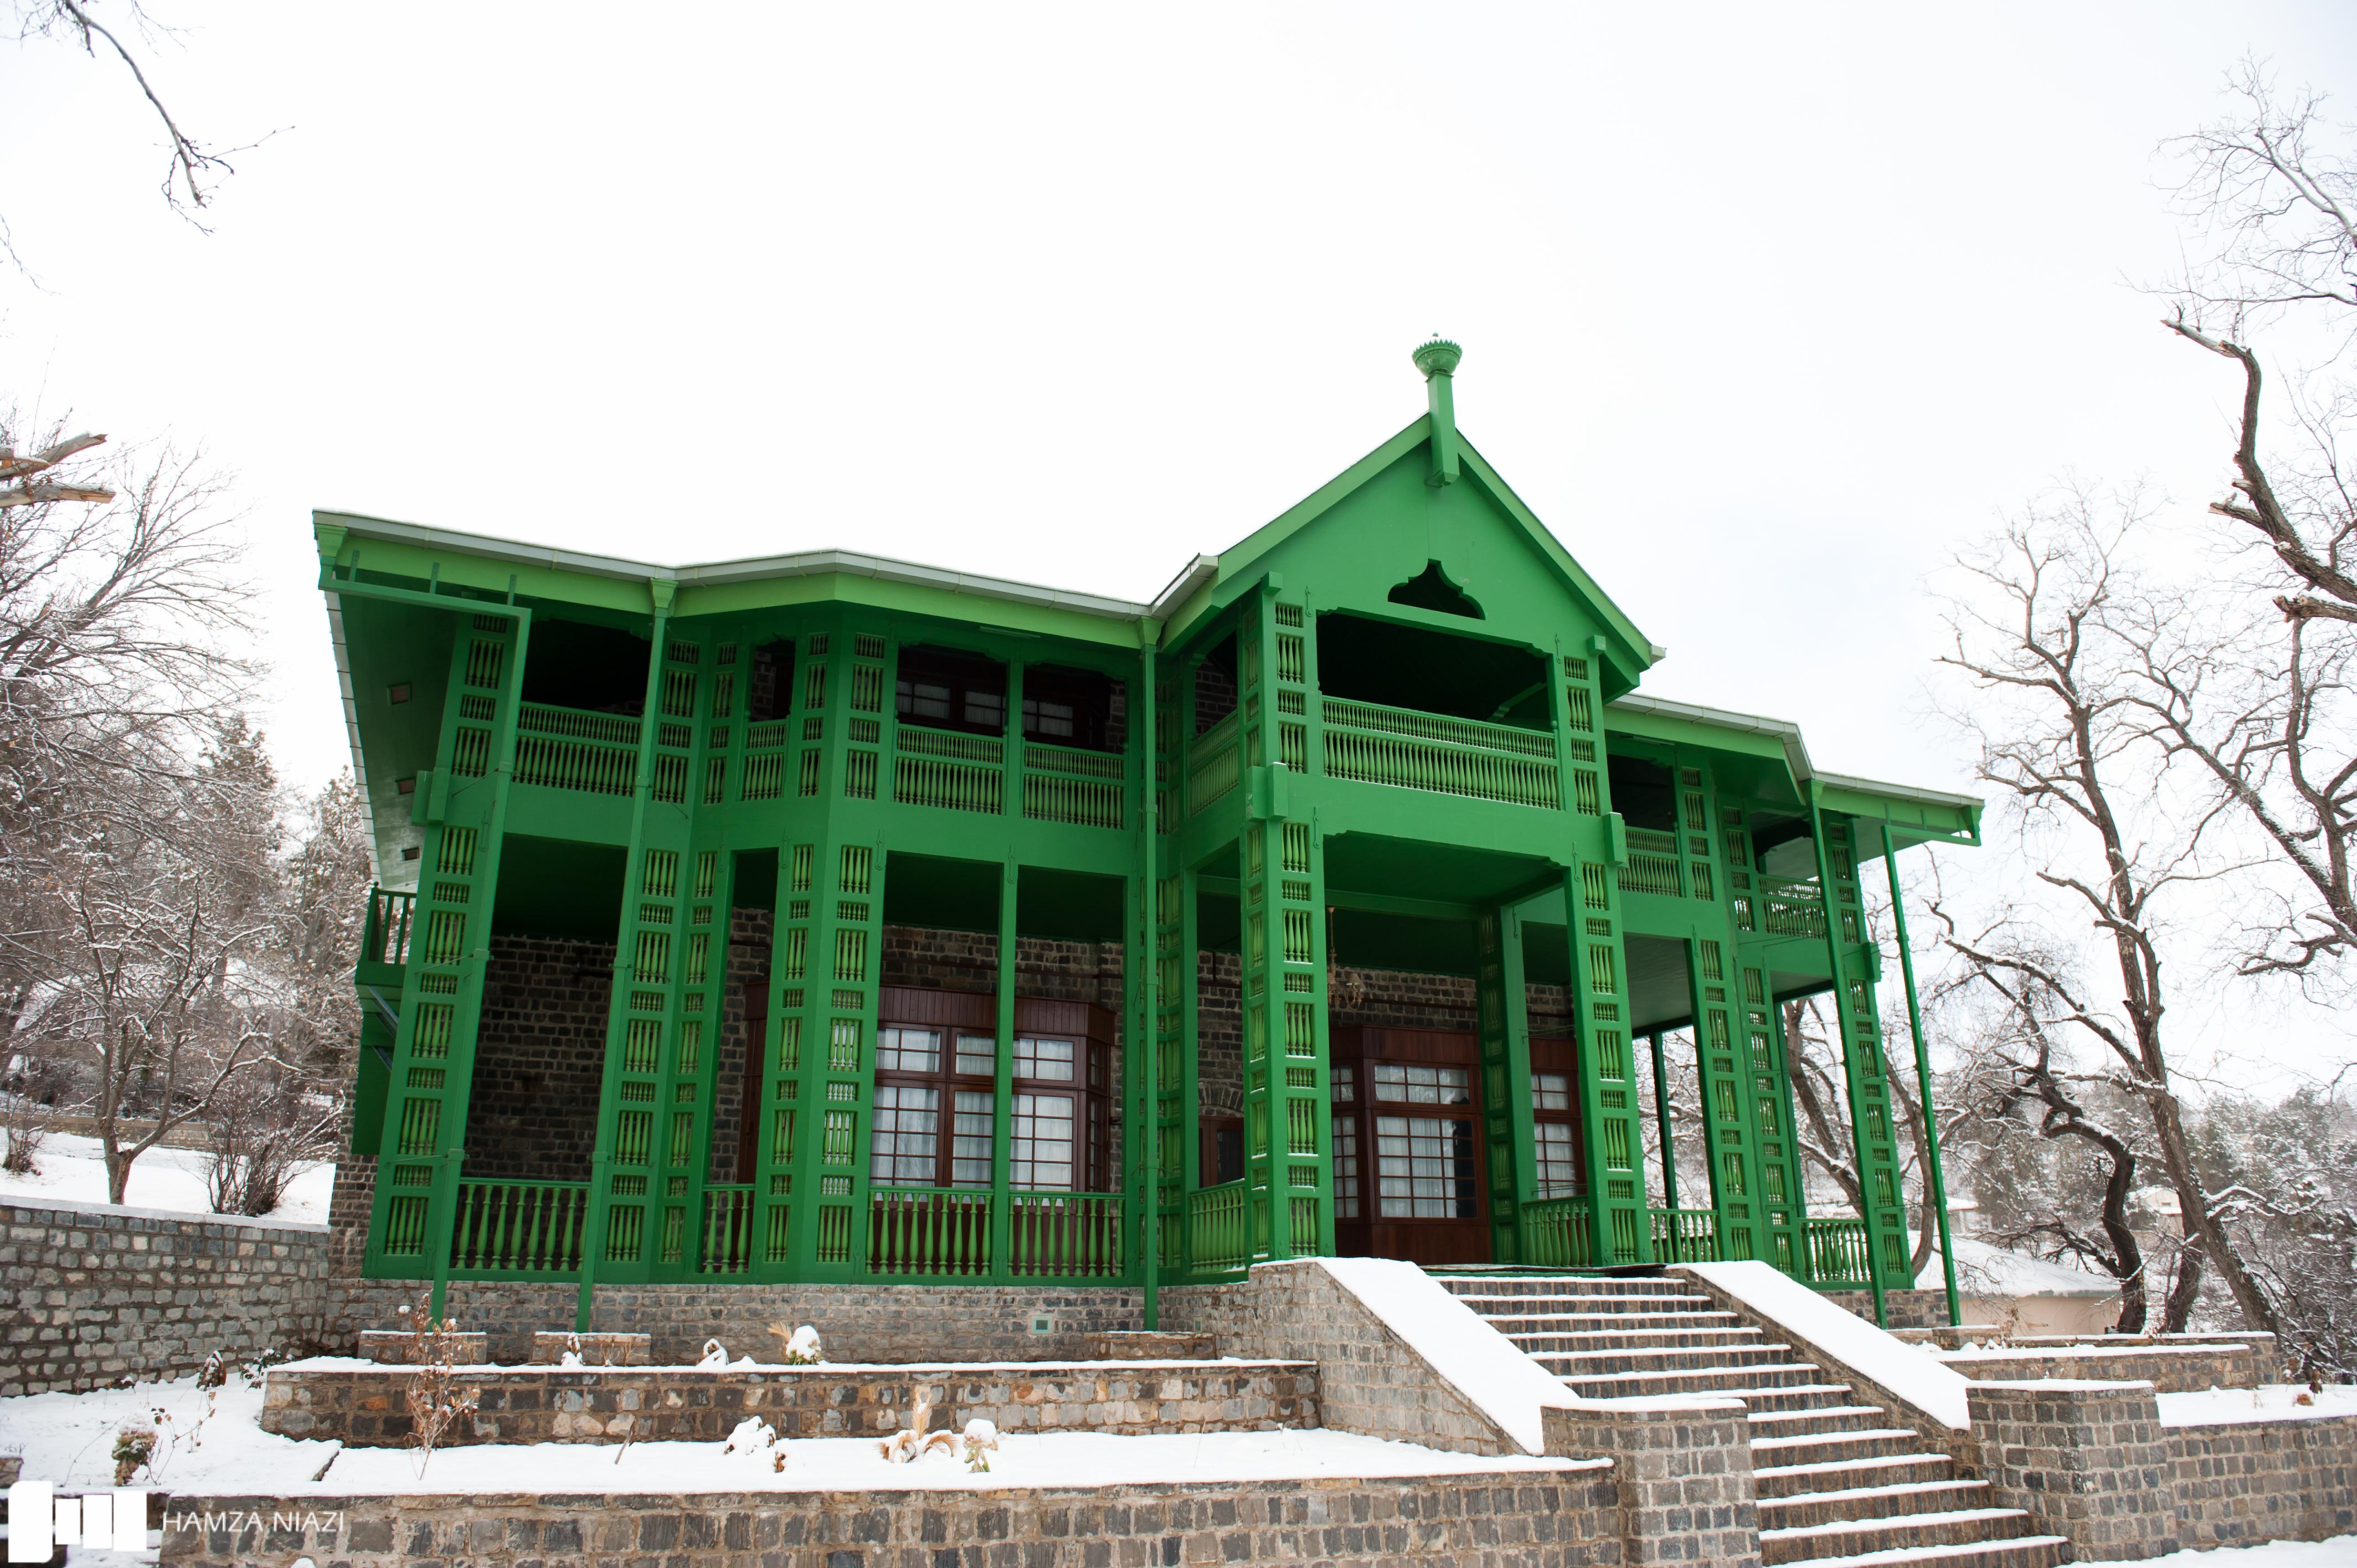 Ziarat residency attack video